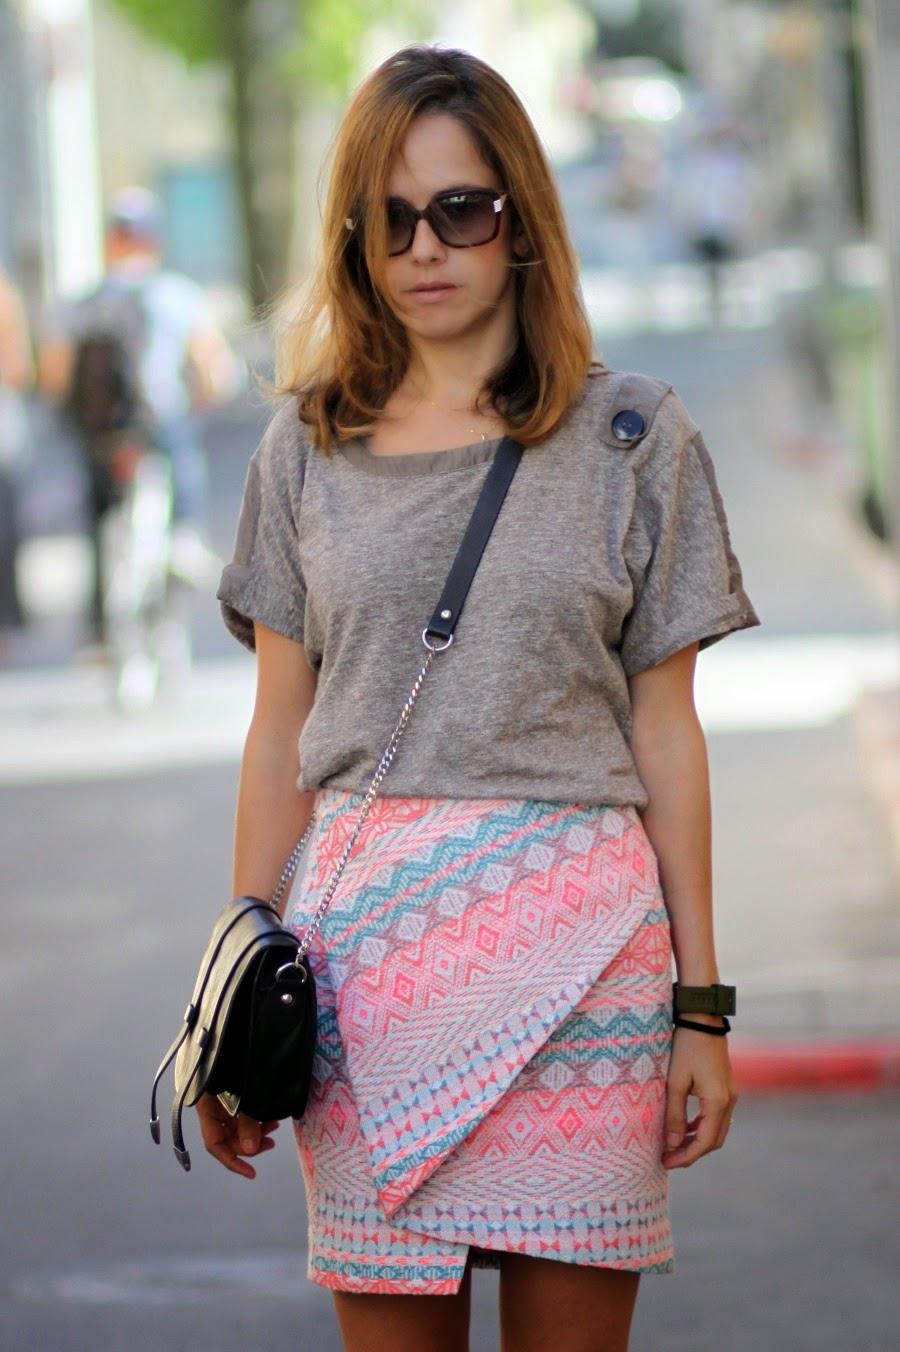 lookoftheday, wrapskirt, zaradaily, ss15, streetstyle, Iro, adidashoes, fashionblog, אופנה, בלוגאופנה, סטייל